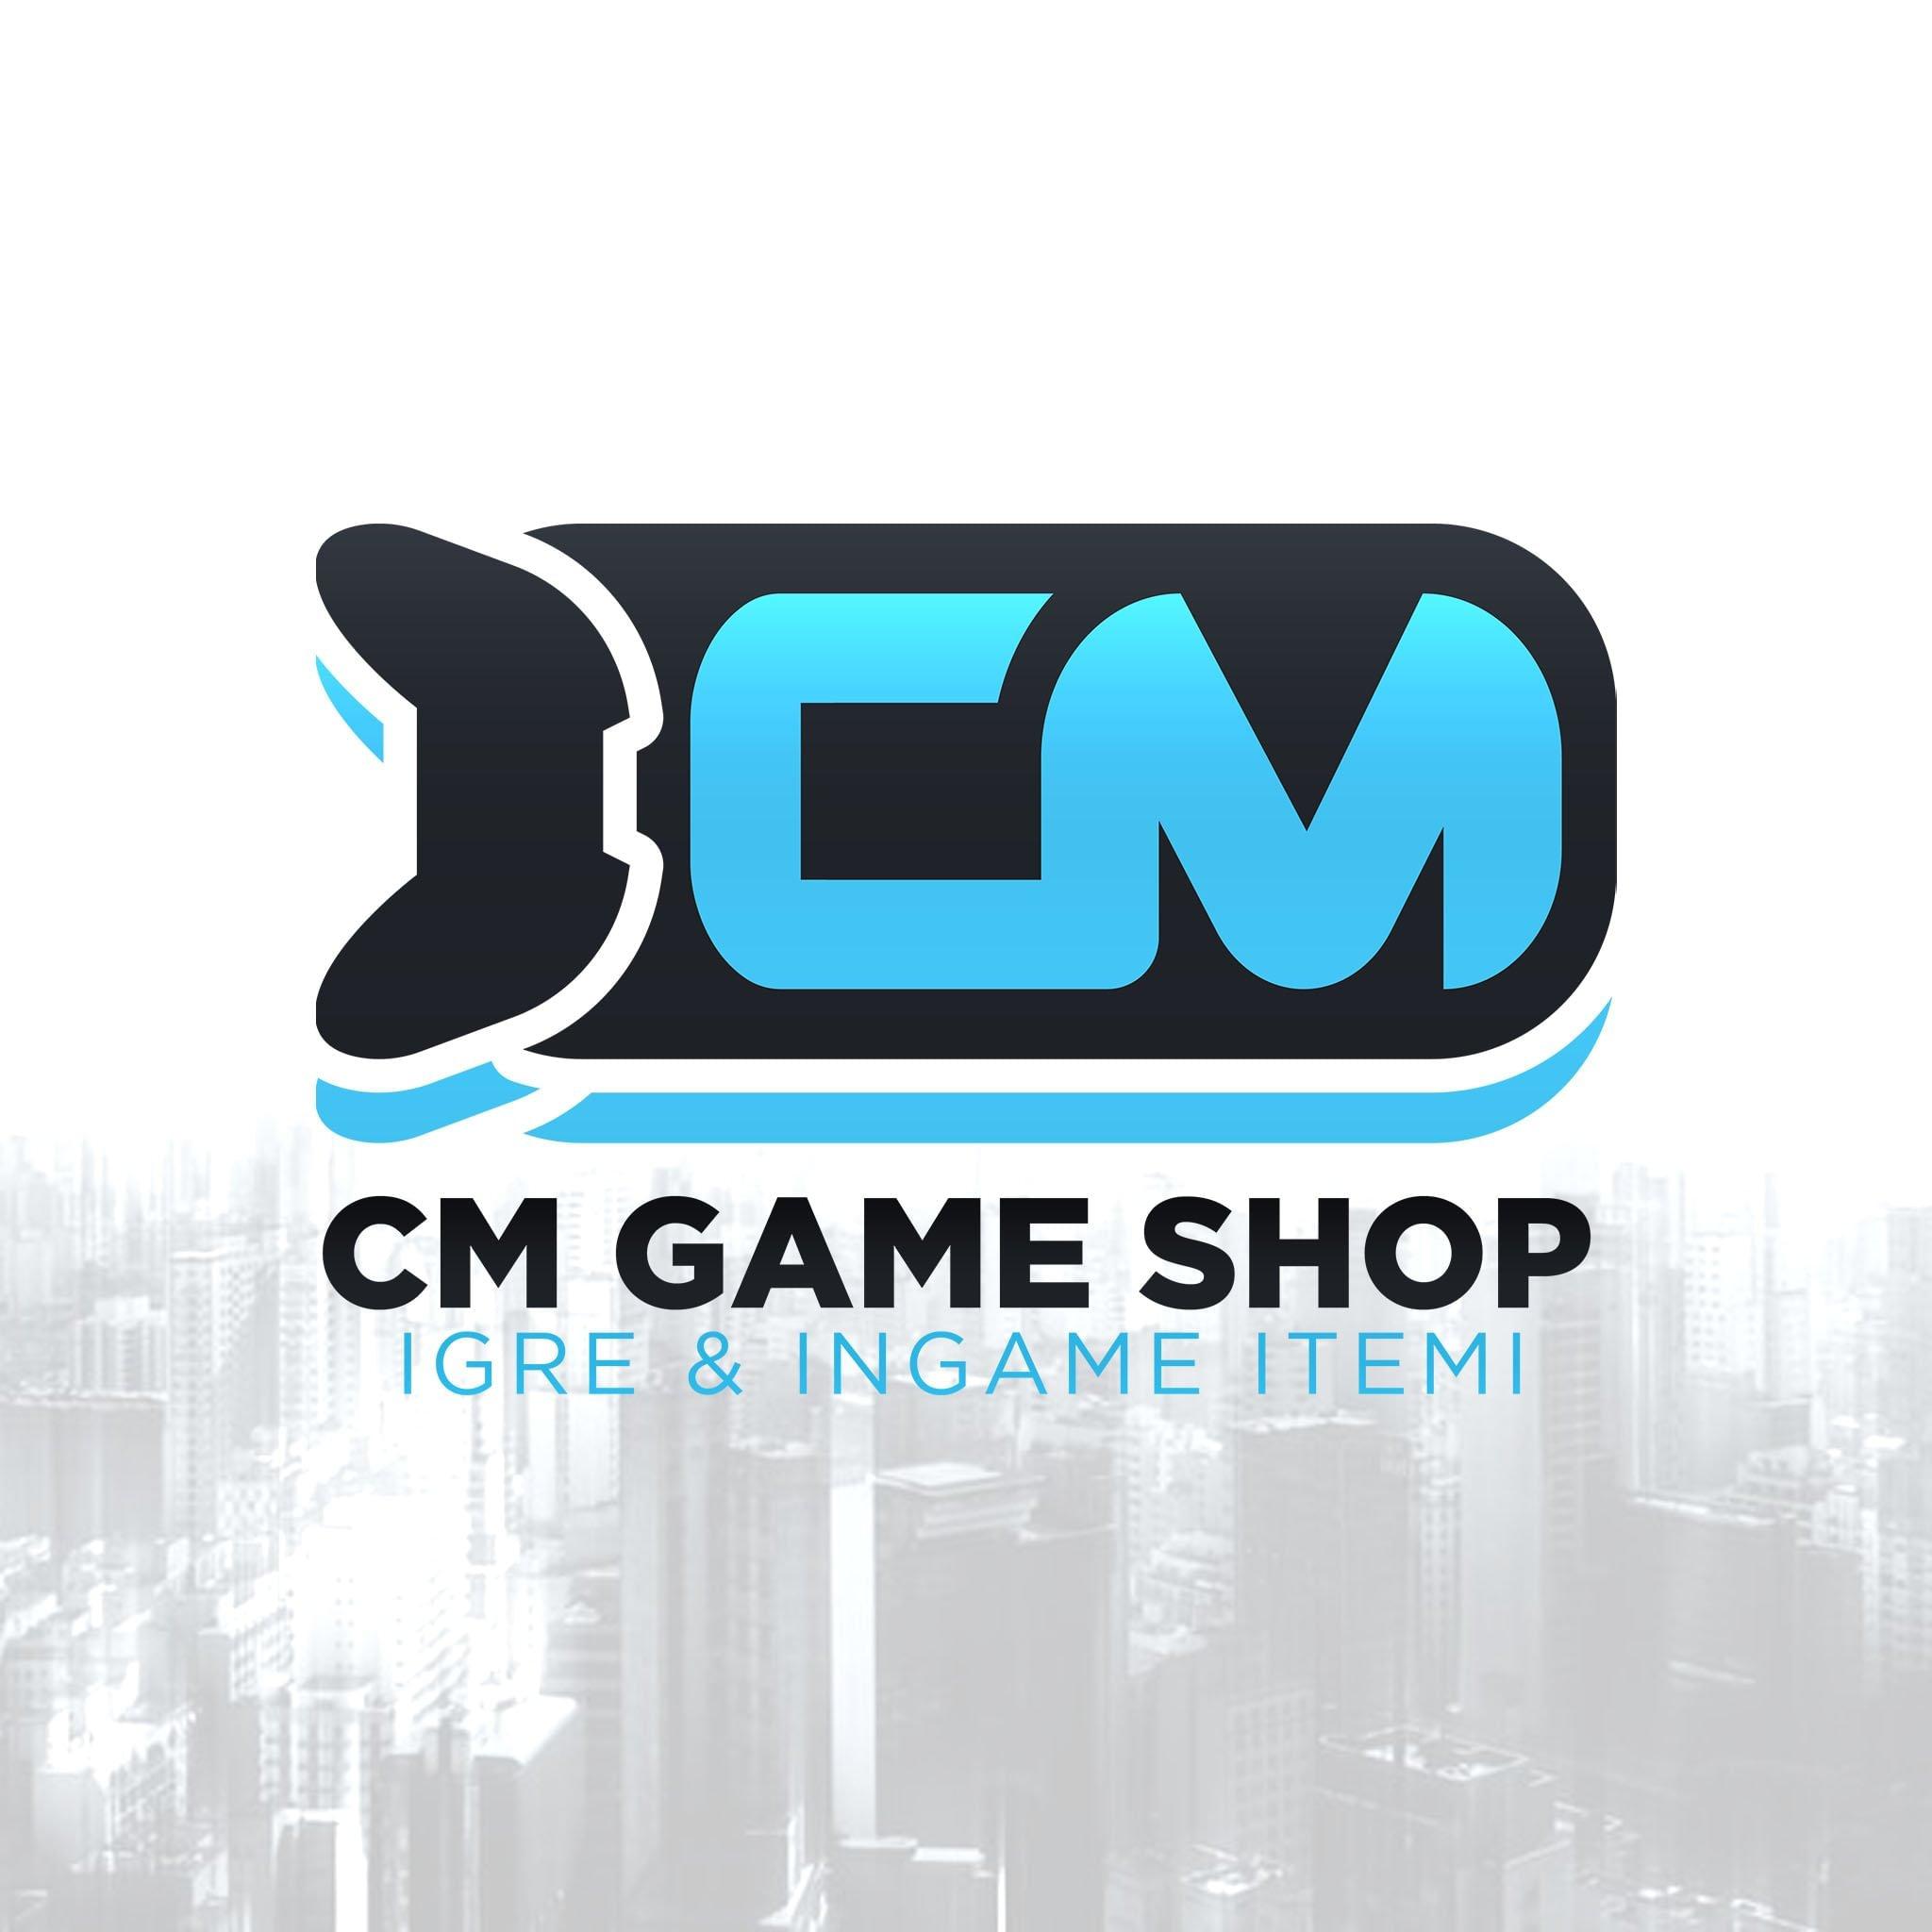 CM Game Shop